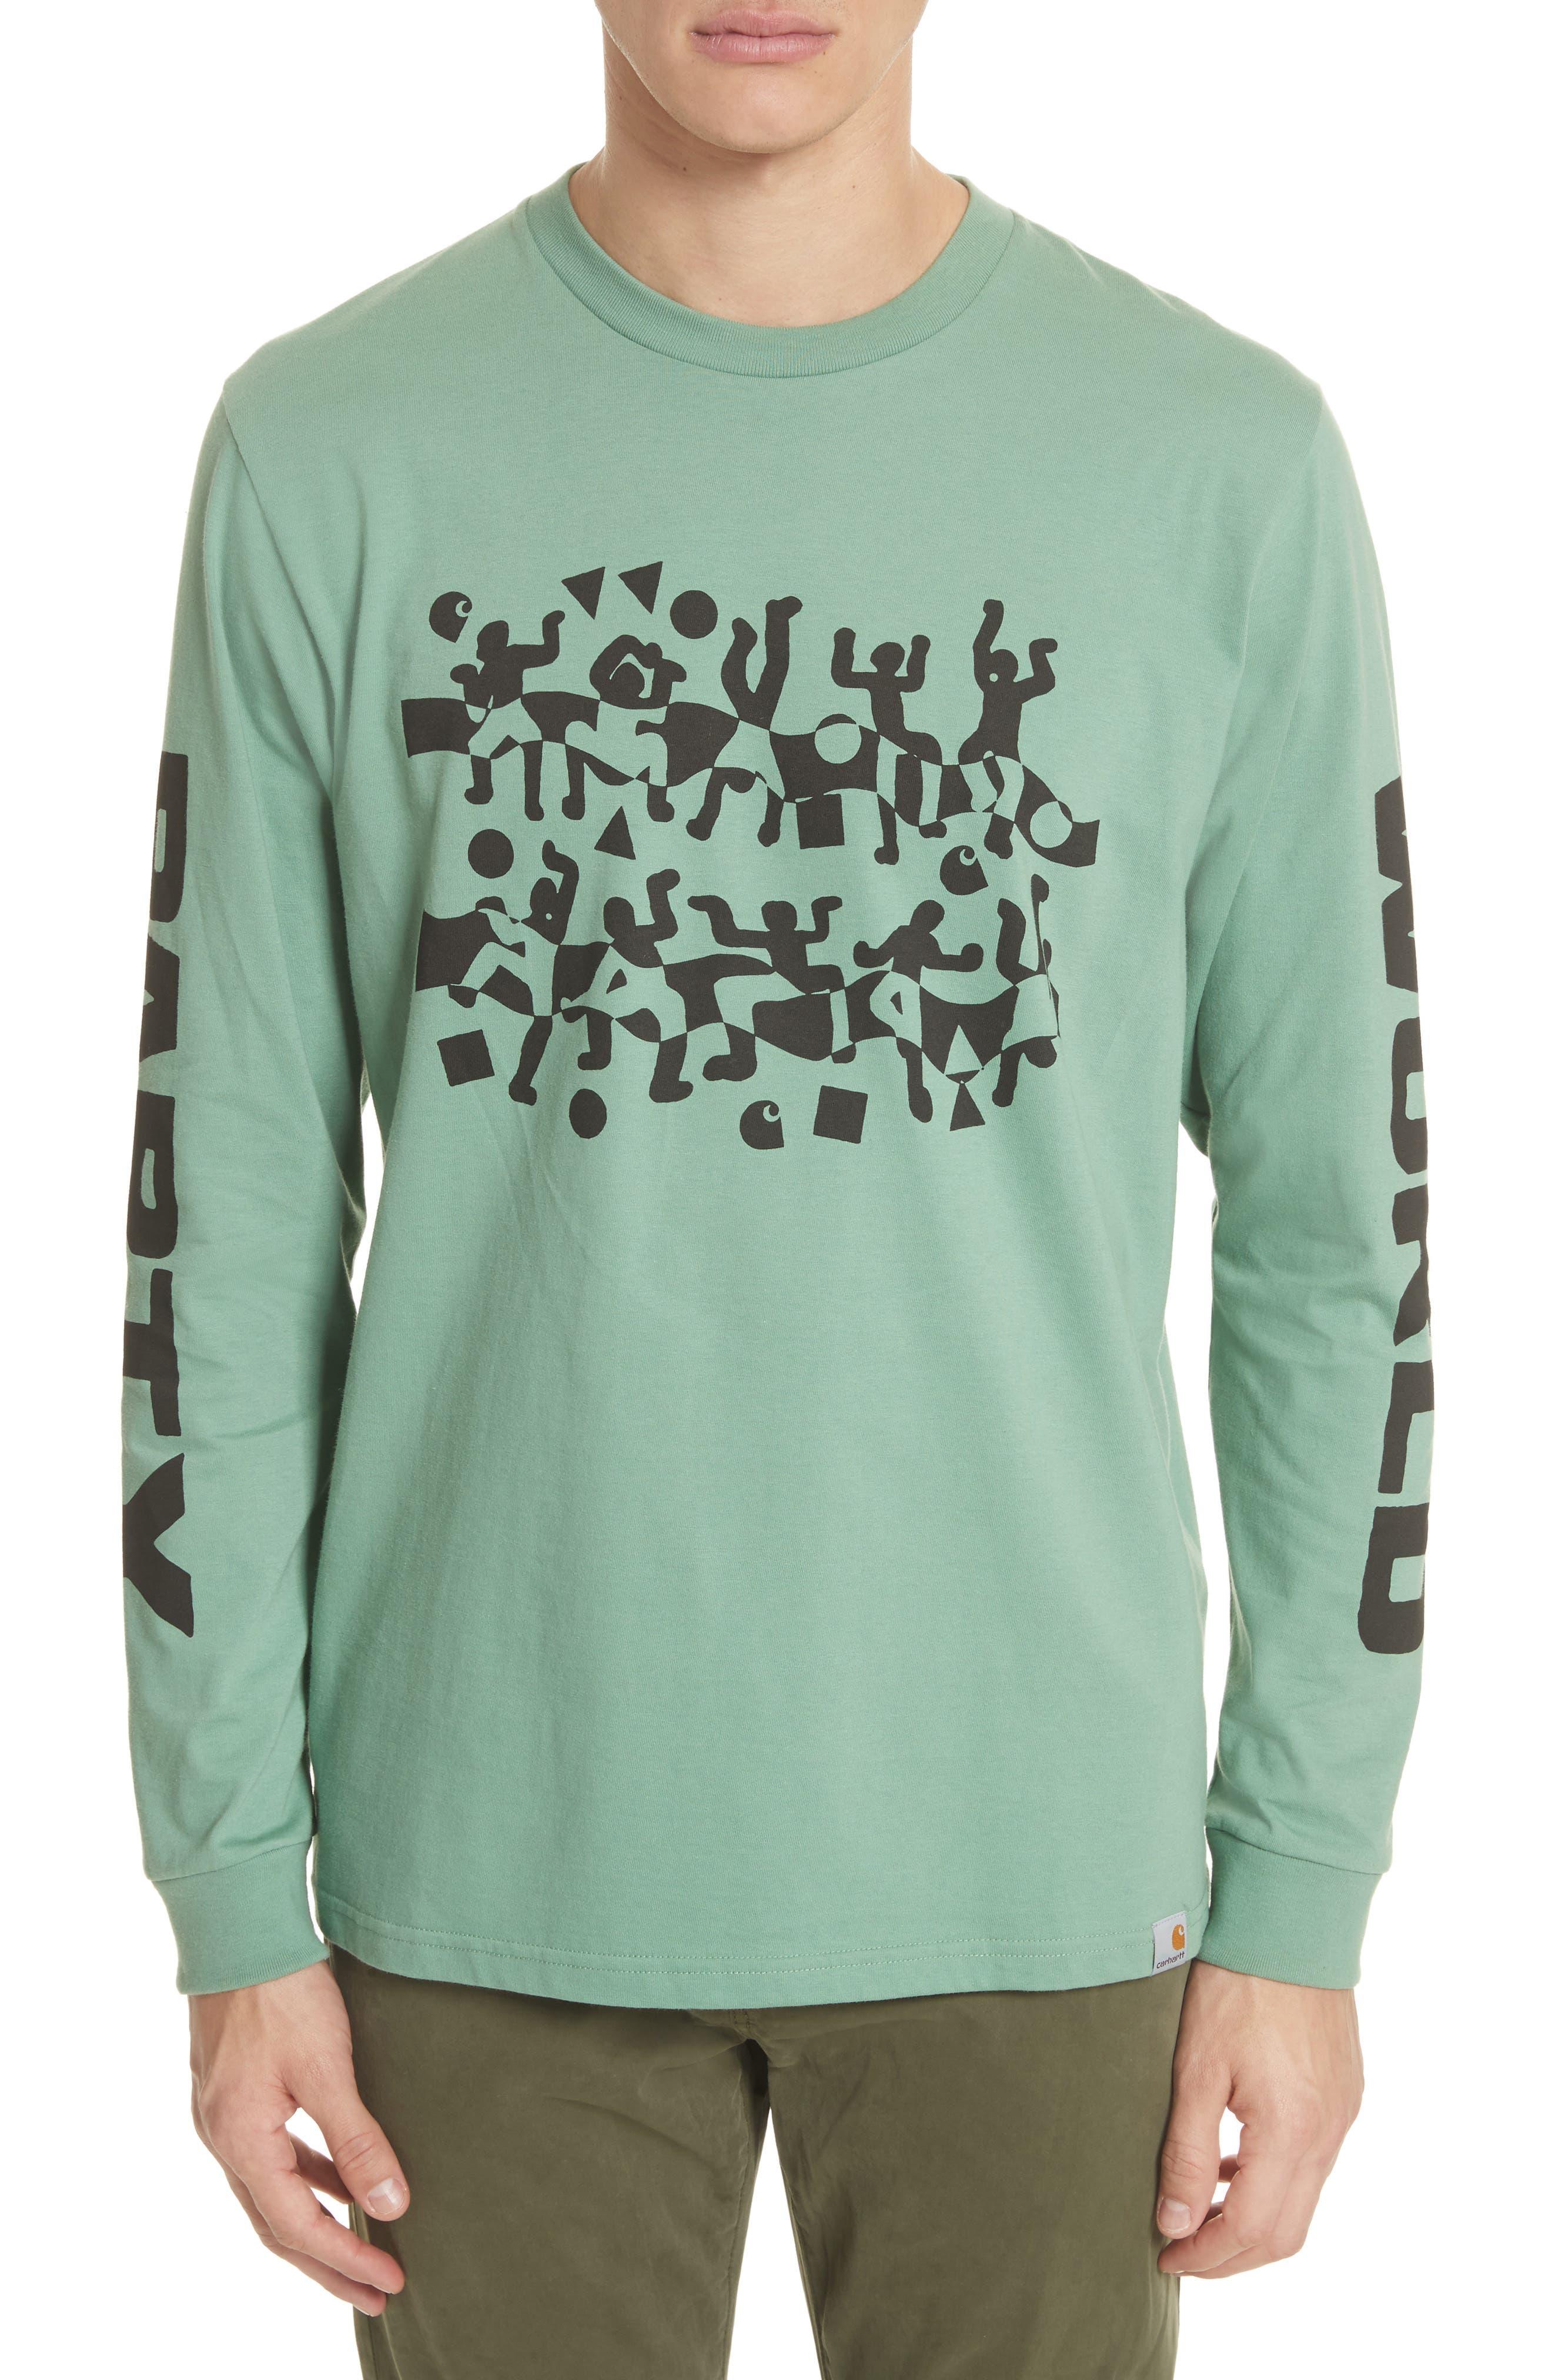 World Party T-Shirt,                             Main thumbnail 1, color,                             Catnip/Black